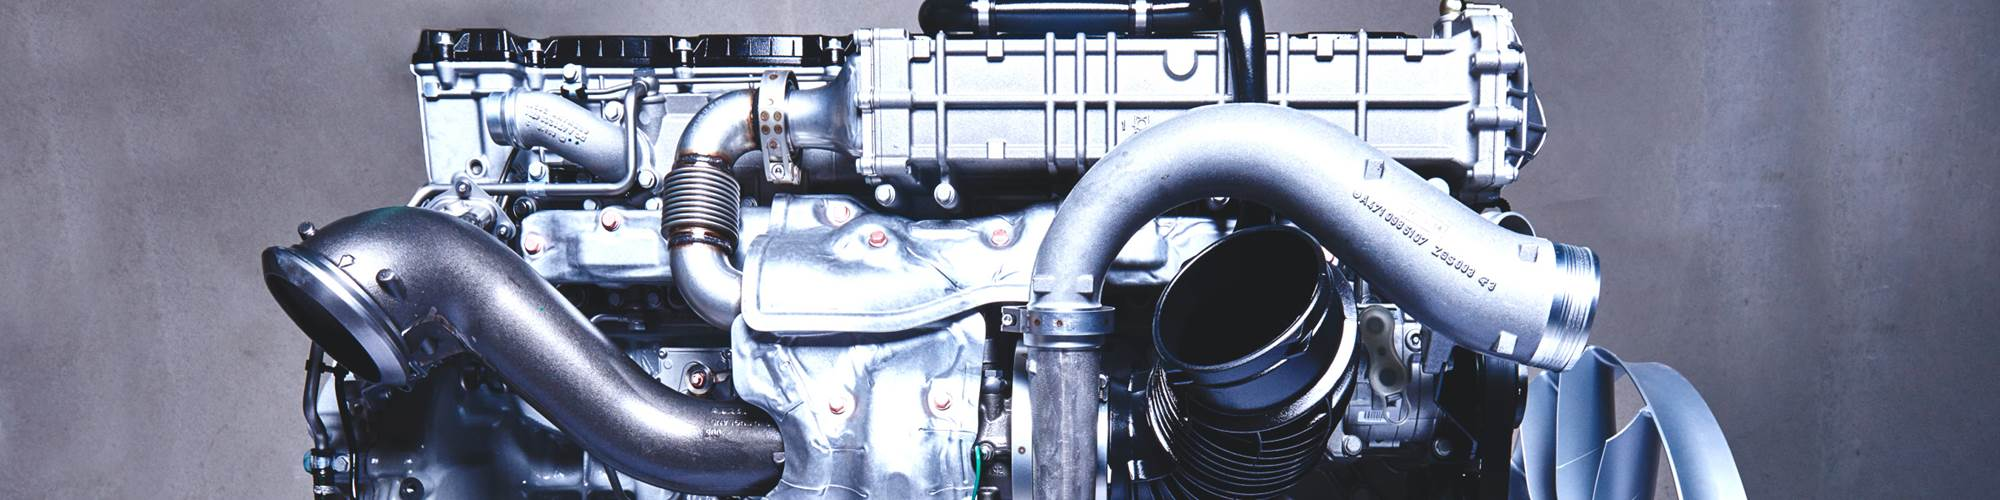 Mercedes-Benz OM 471 powertrain